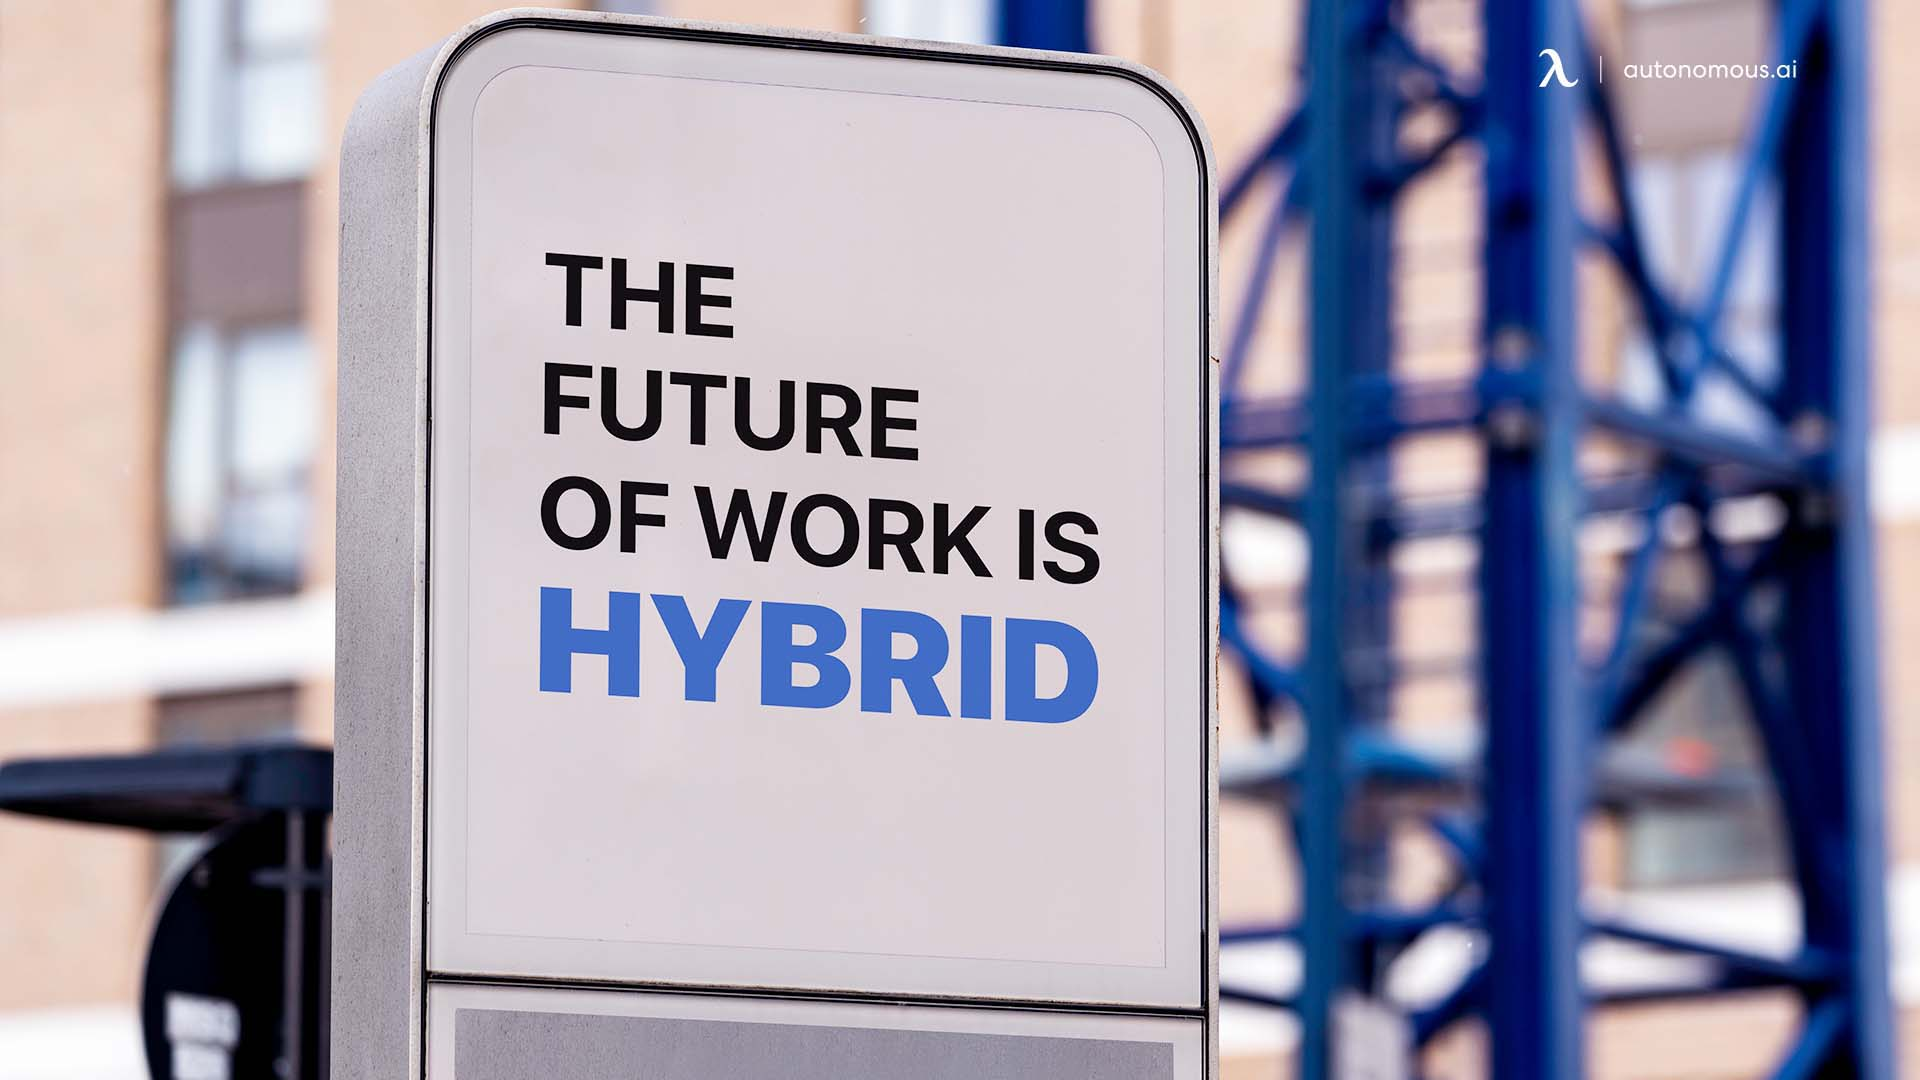 Rise of Hybrid office